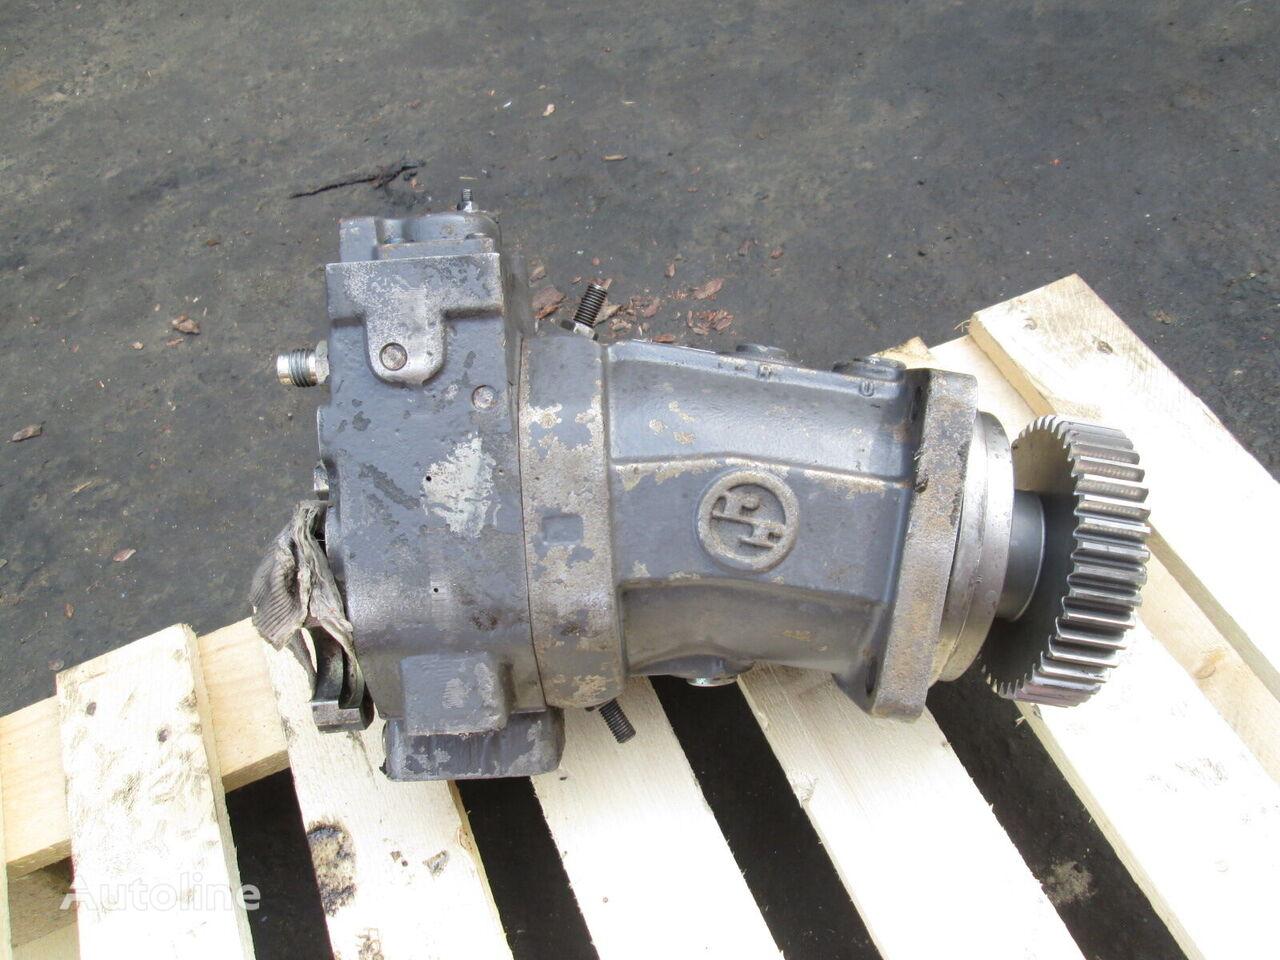 VOLVO S-87 part no 9014343112 hydraulic motor for wheel loader